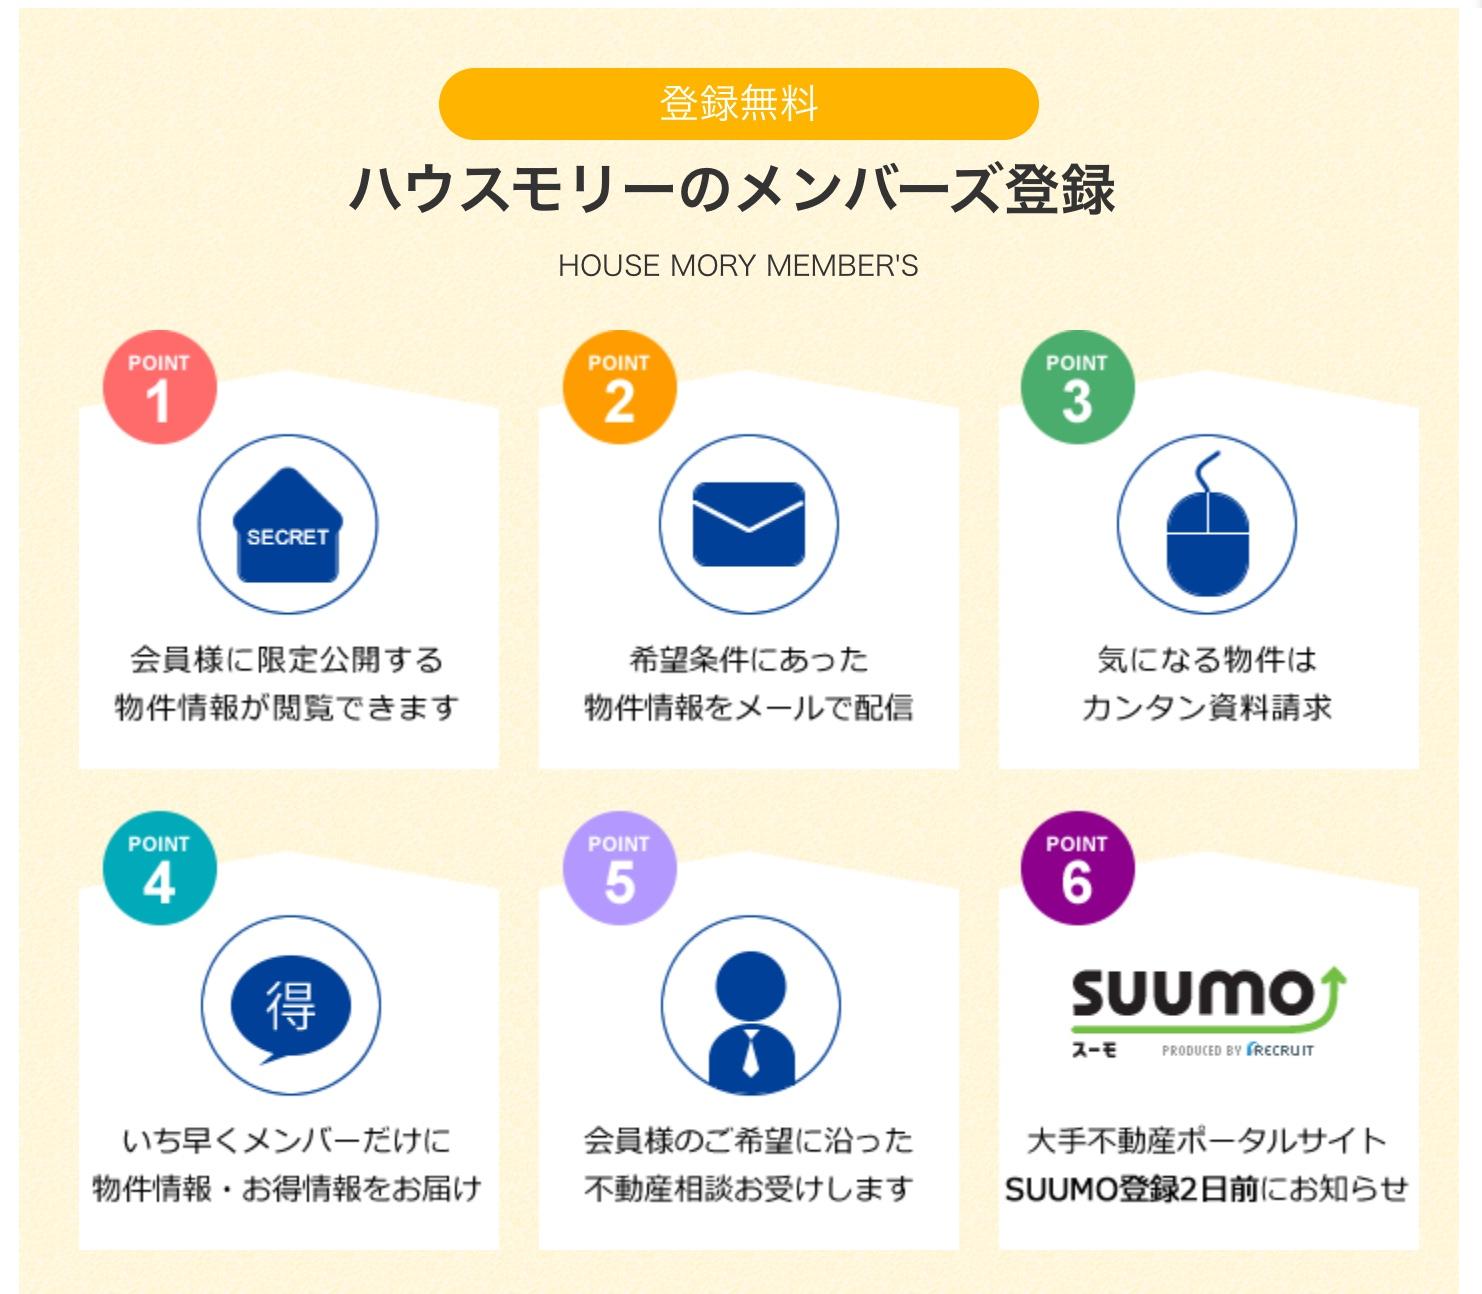 [NEW]SUUMO登録2日前の最新物件情報は無料メンバーズ登録!